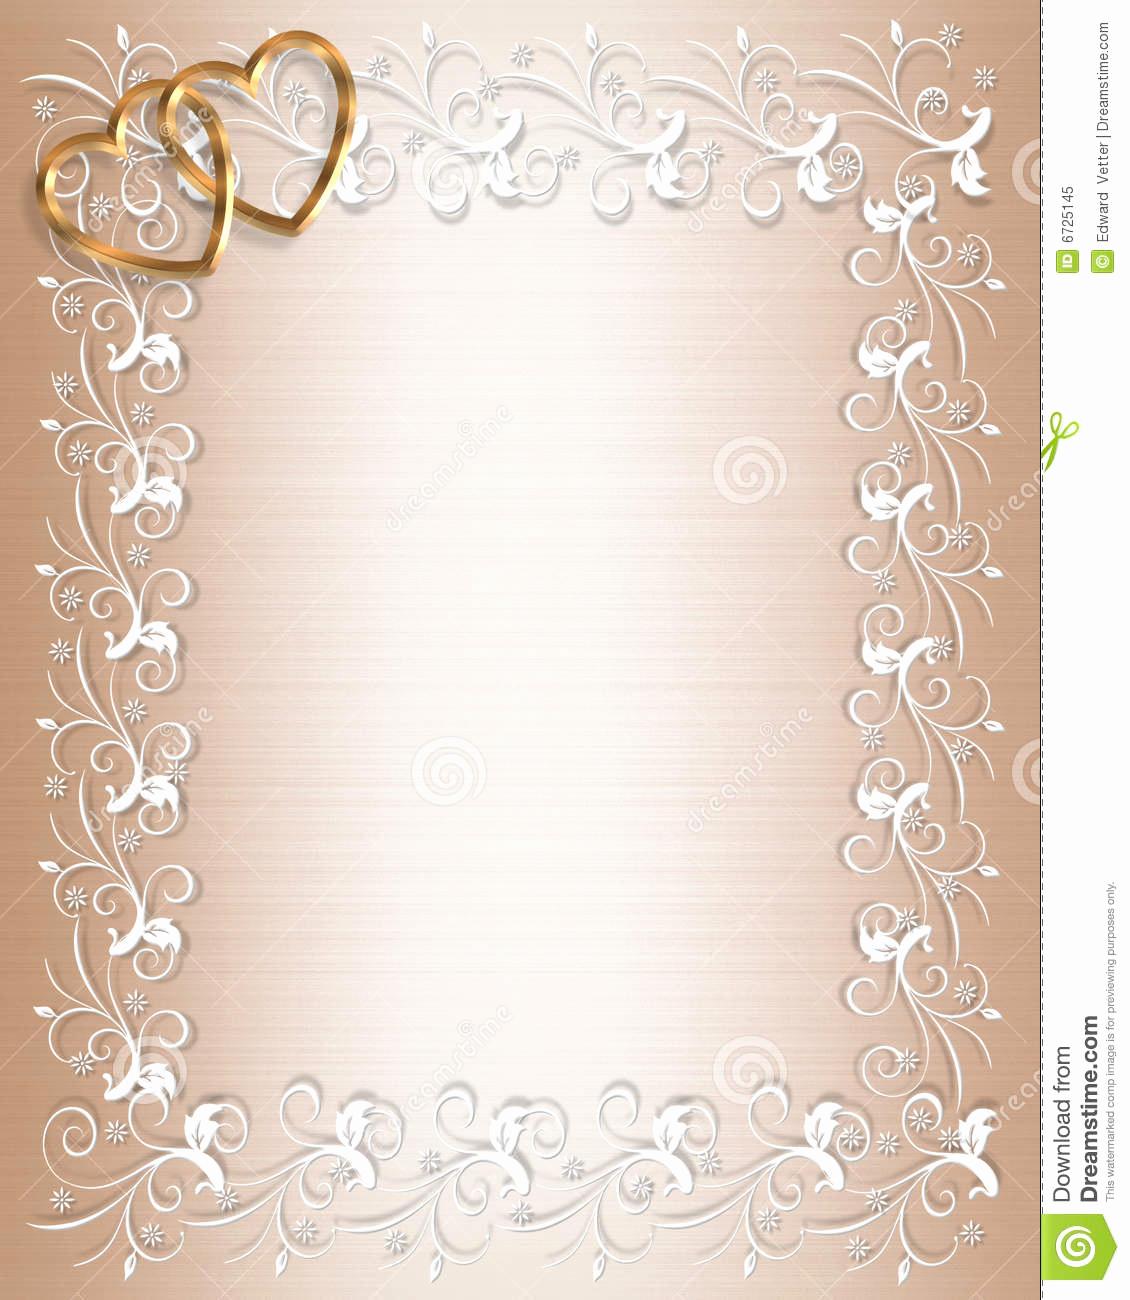 Wedding Invitation Borders Design Luxury Free Background Borders to Clipground